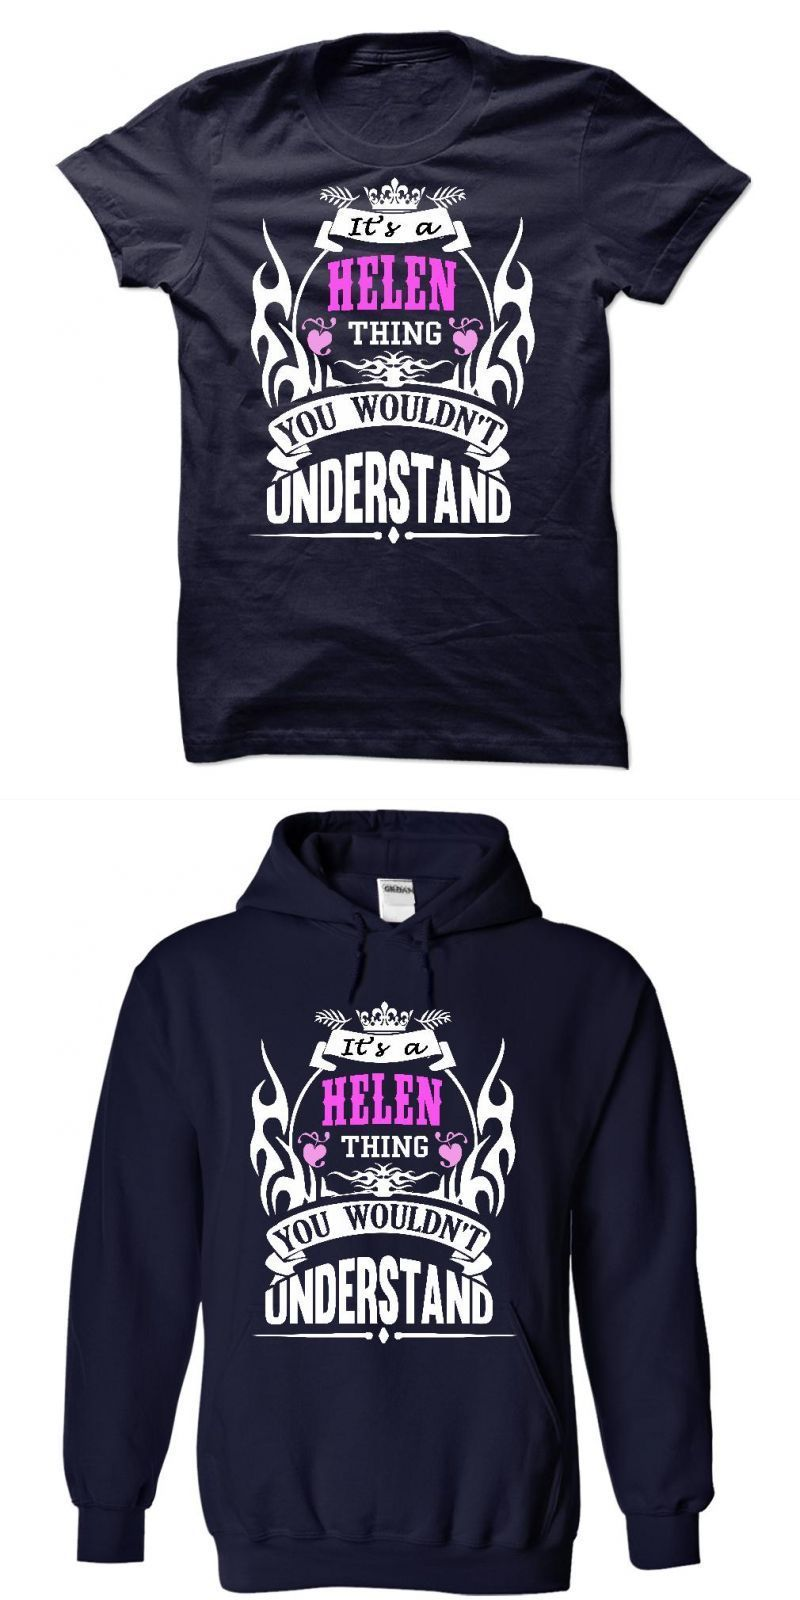 vans t shirt 2015